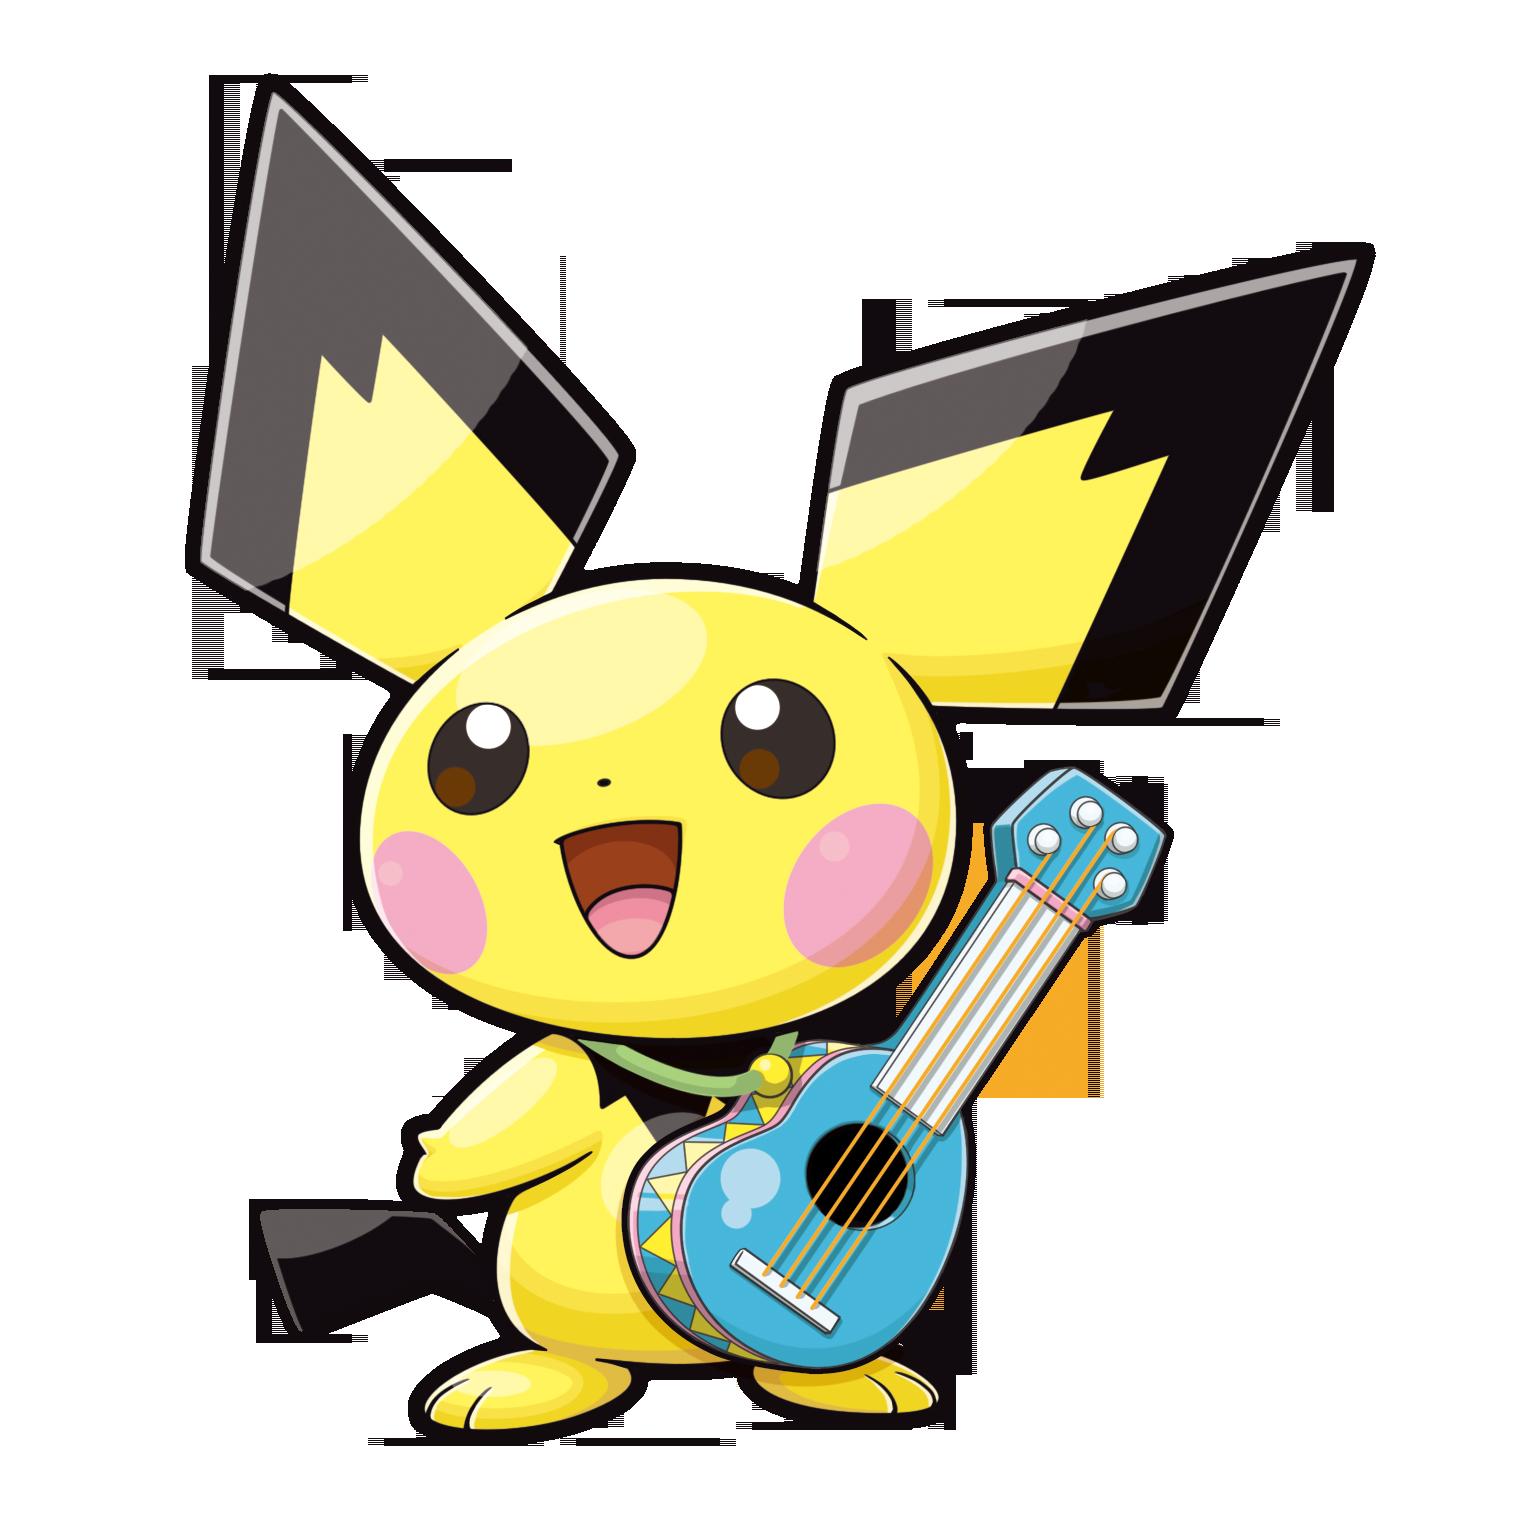 Ukulele anime rock star clipart svg freeuse download Ukulele Pichu | Pokémon Wiki | FANDOM powered by Wikia svg freeuse download